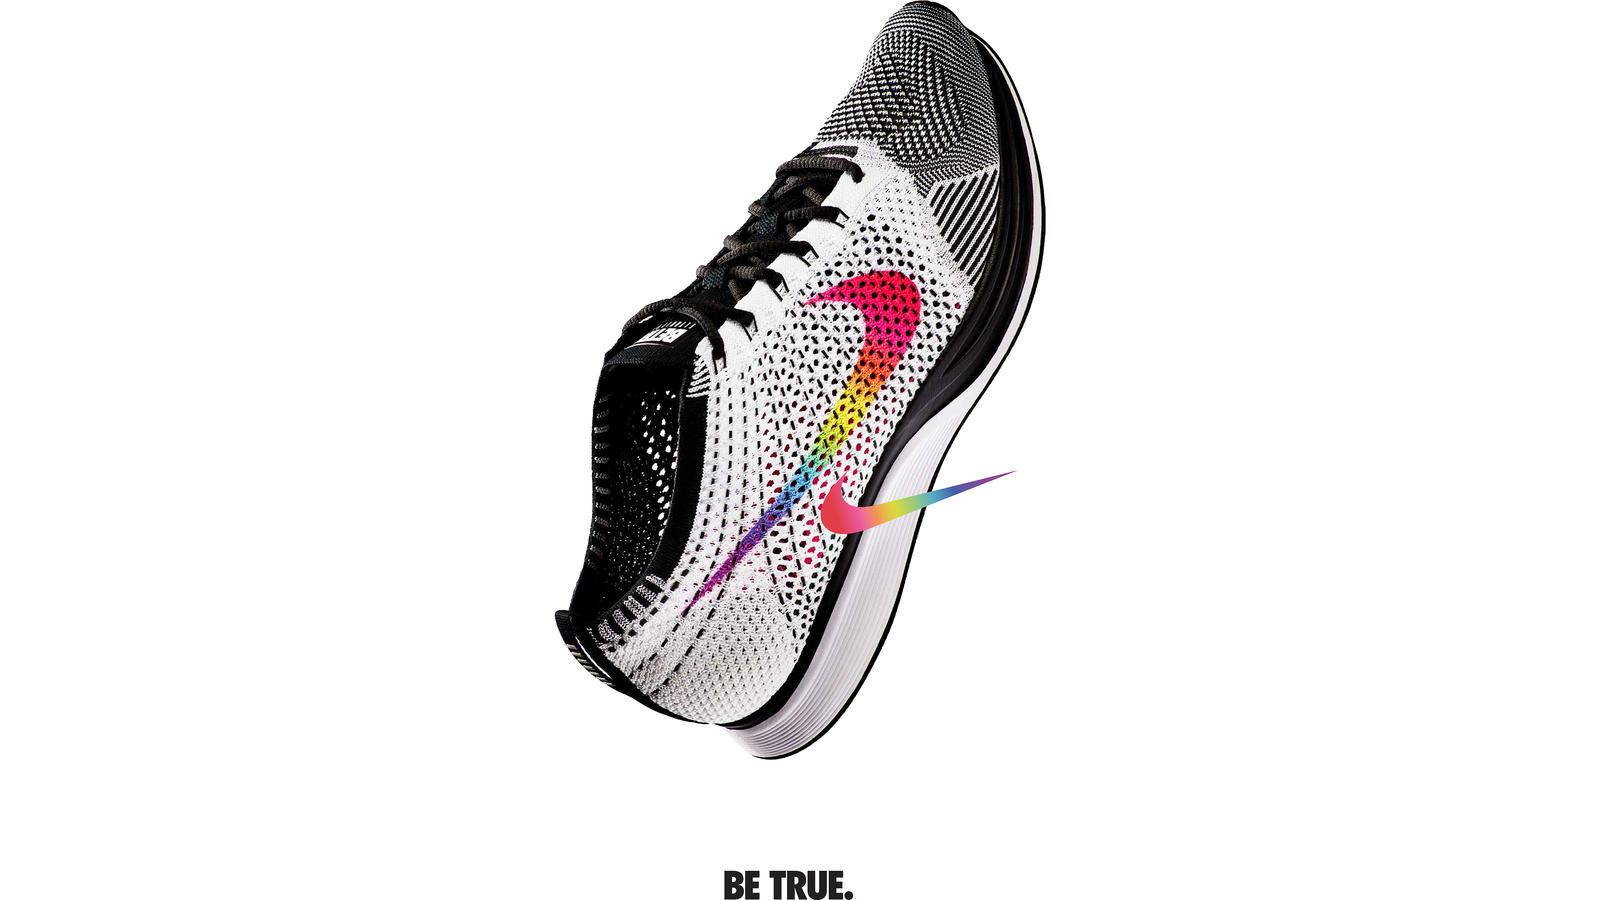 3efaf1b39439b BETRUE 2017 28. Nike Flyknit Racer BETRUE